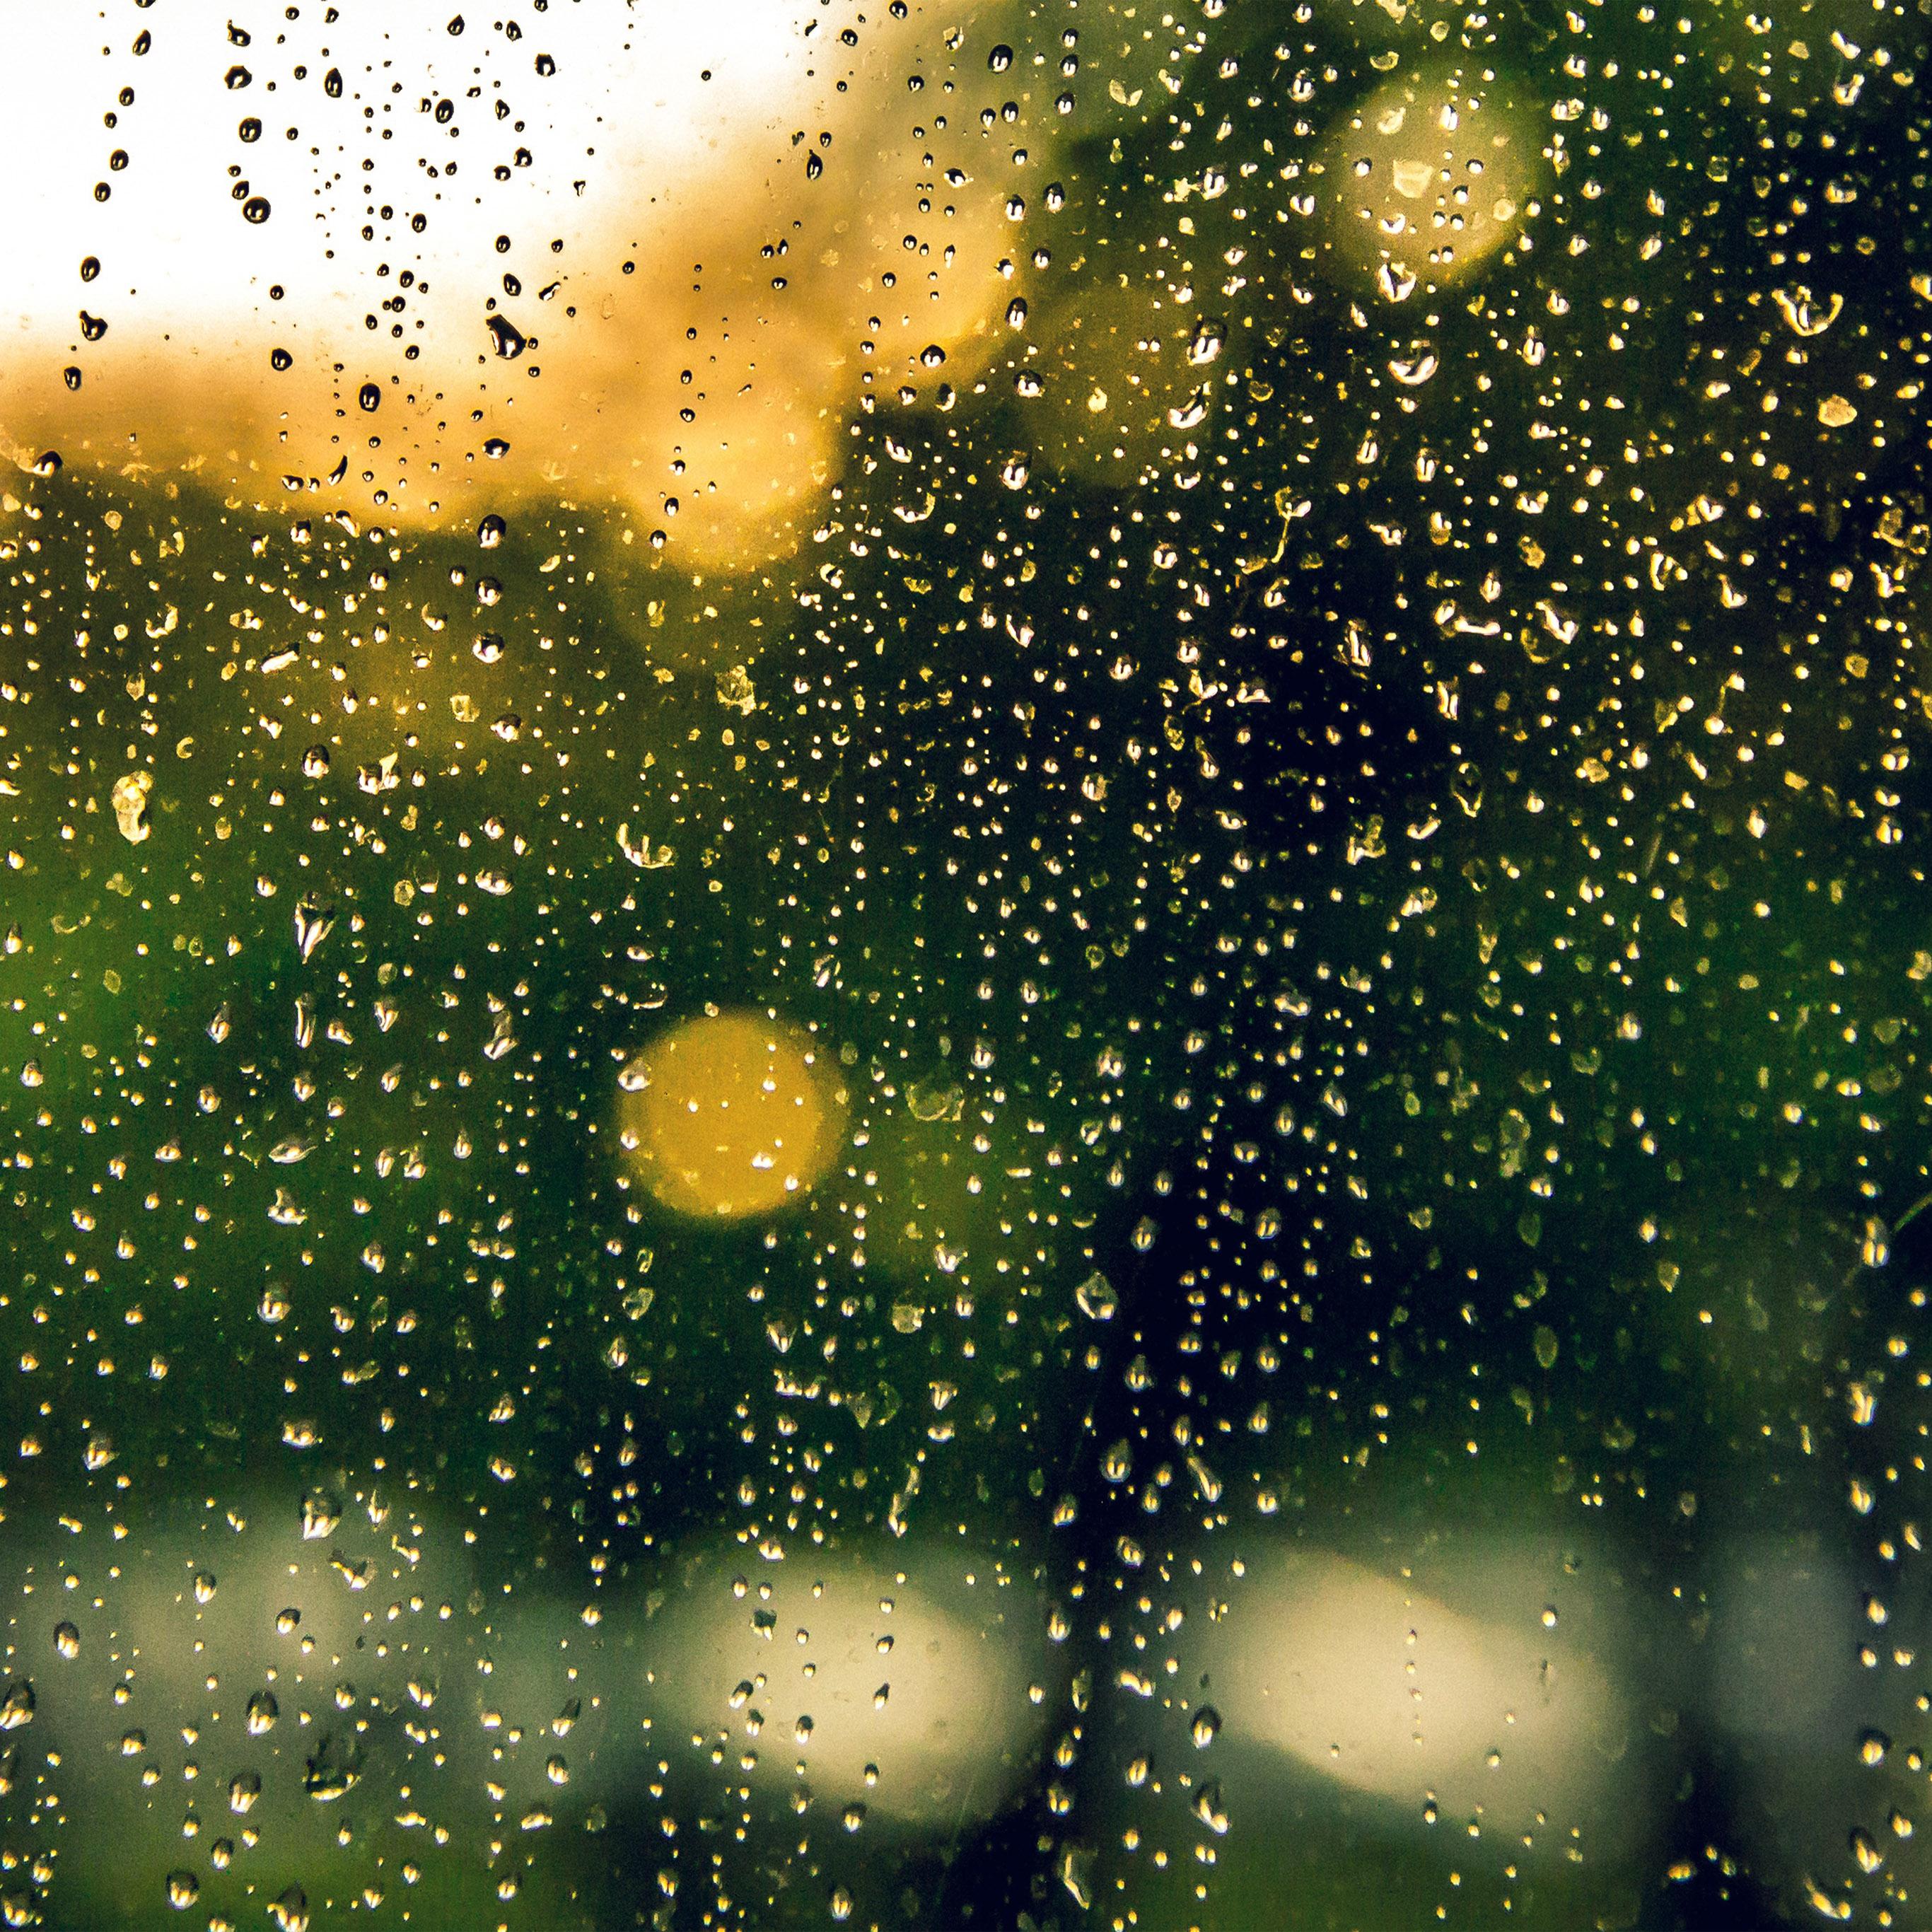 nv02 rain window green nature wallpaper